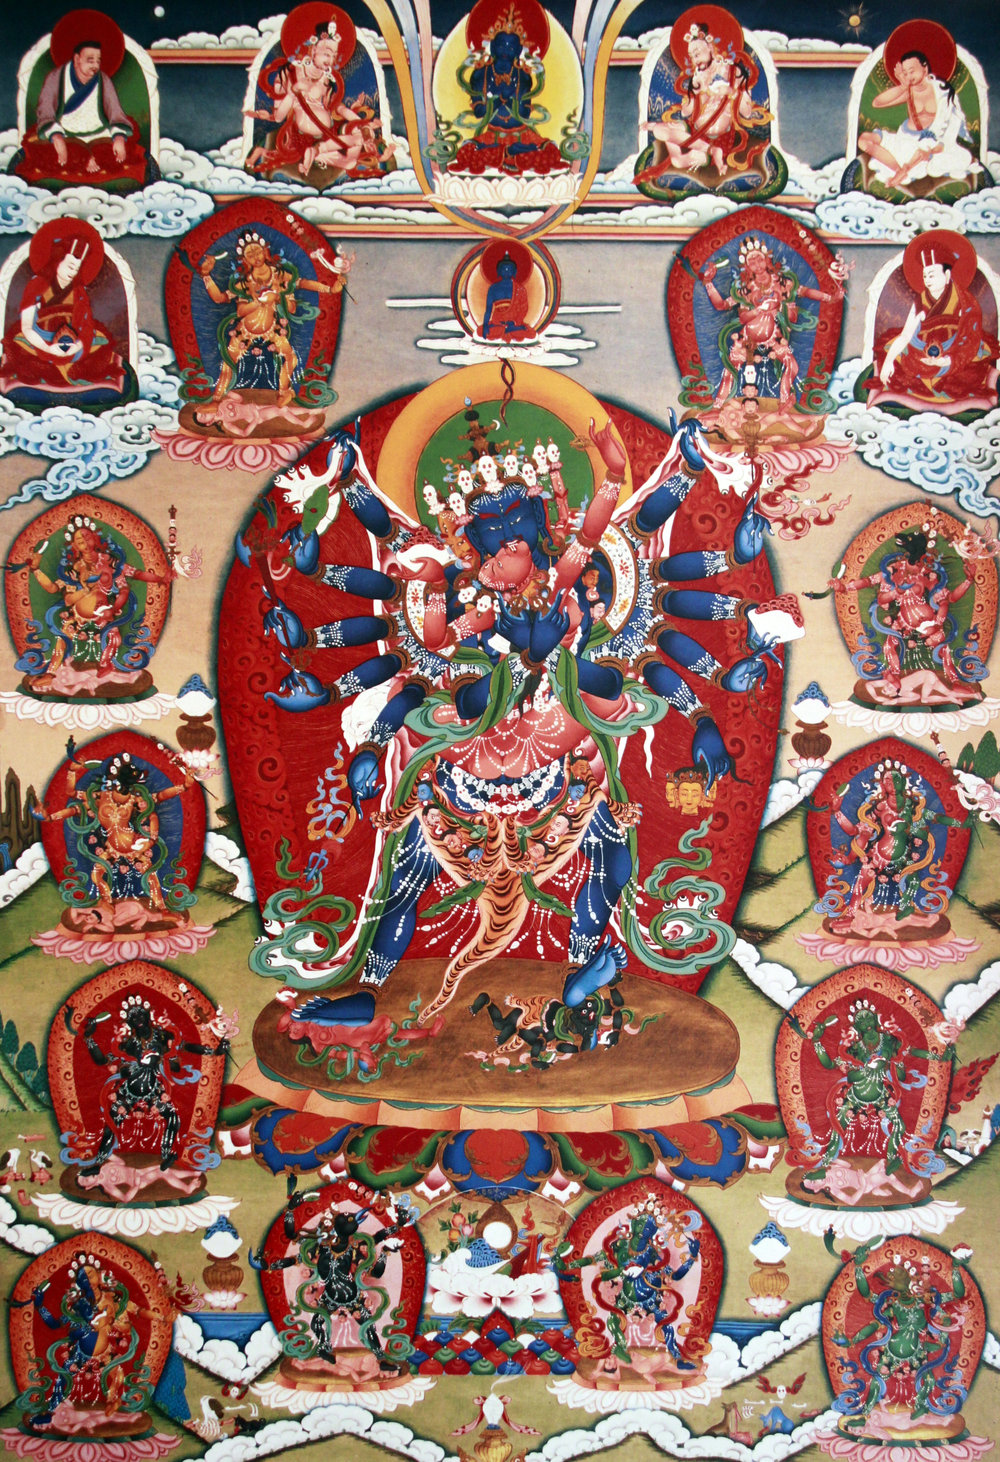 Dechen Choekhor Twelve-armed Chakrasamvara thangka